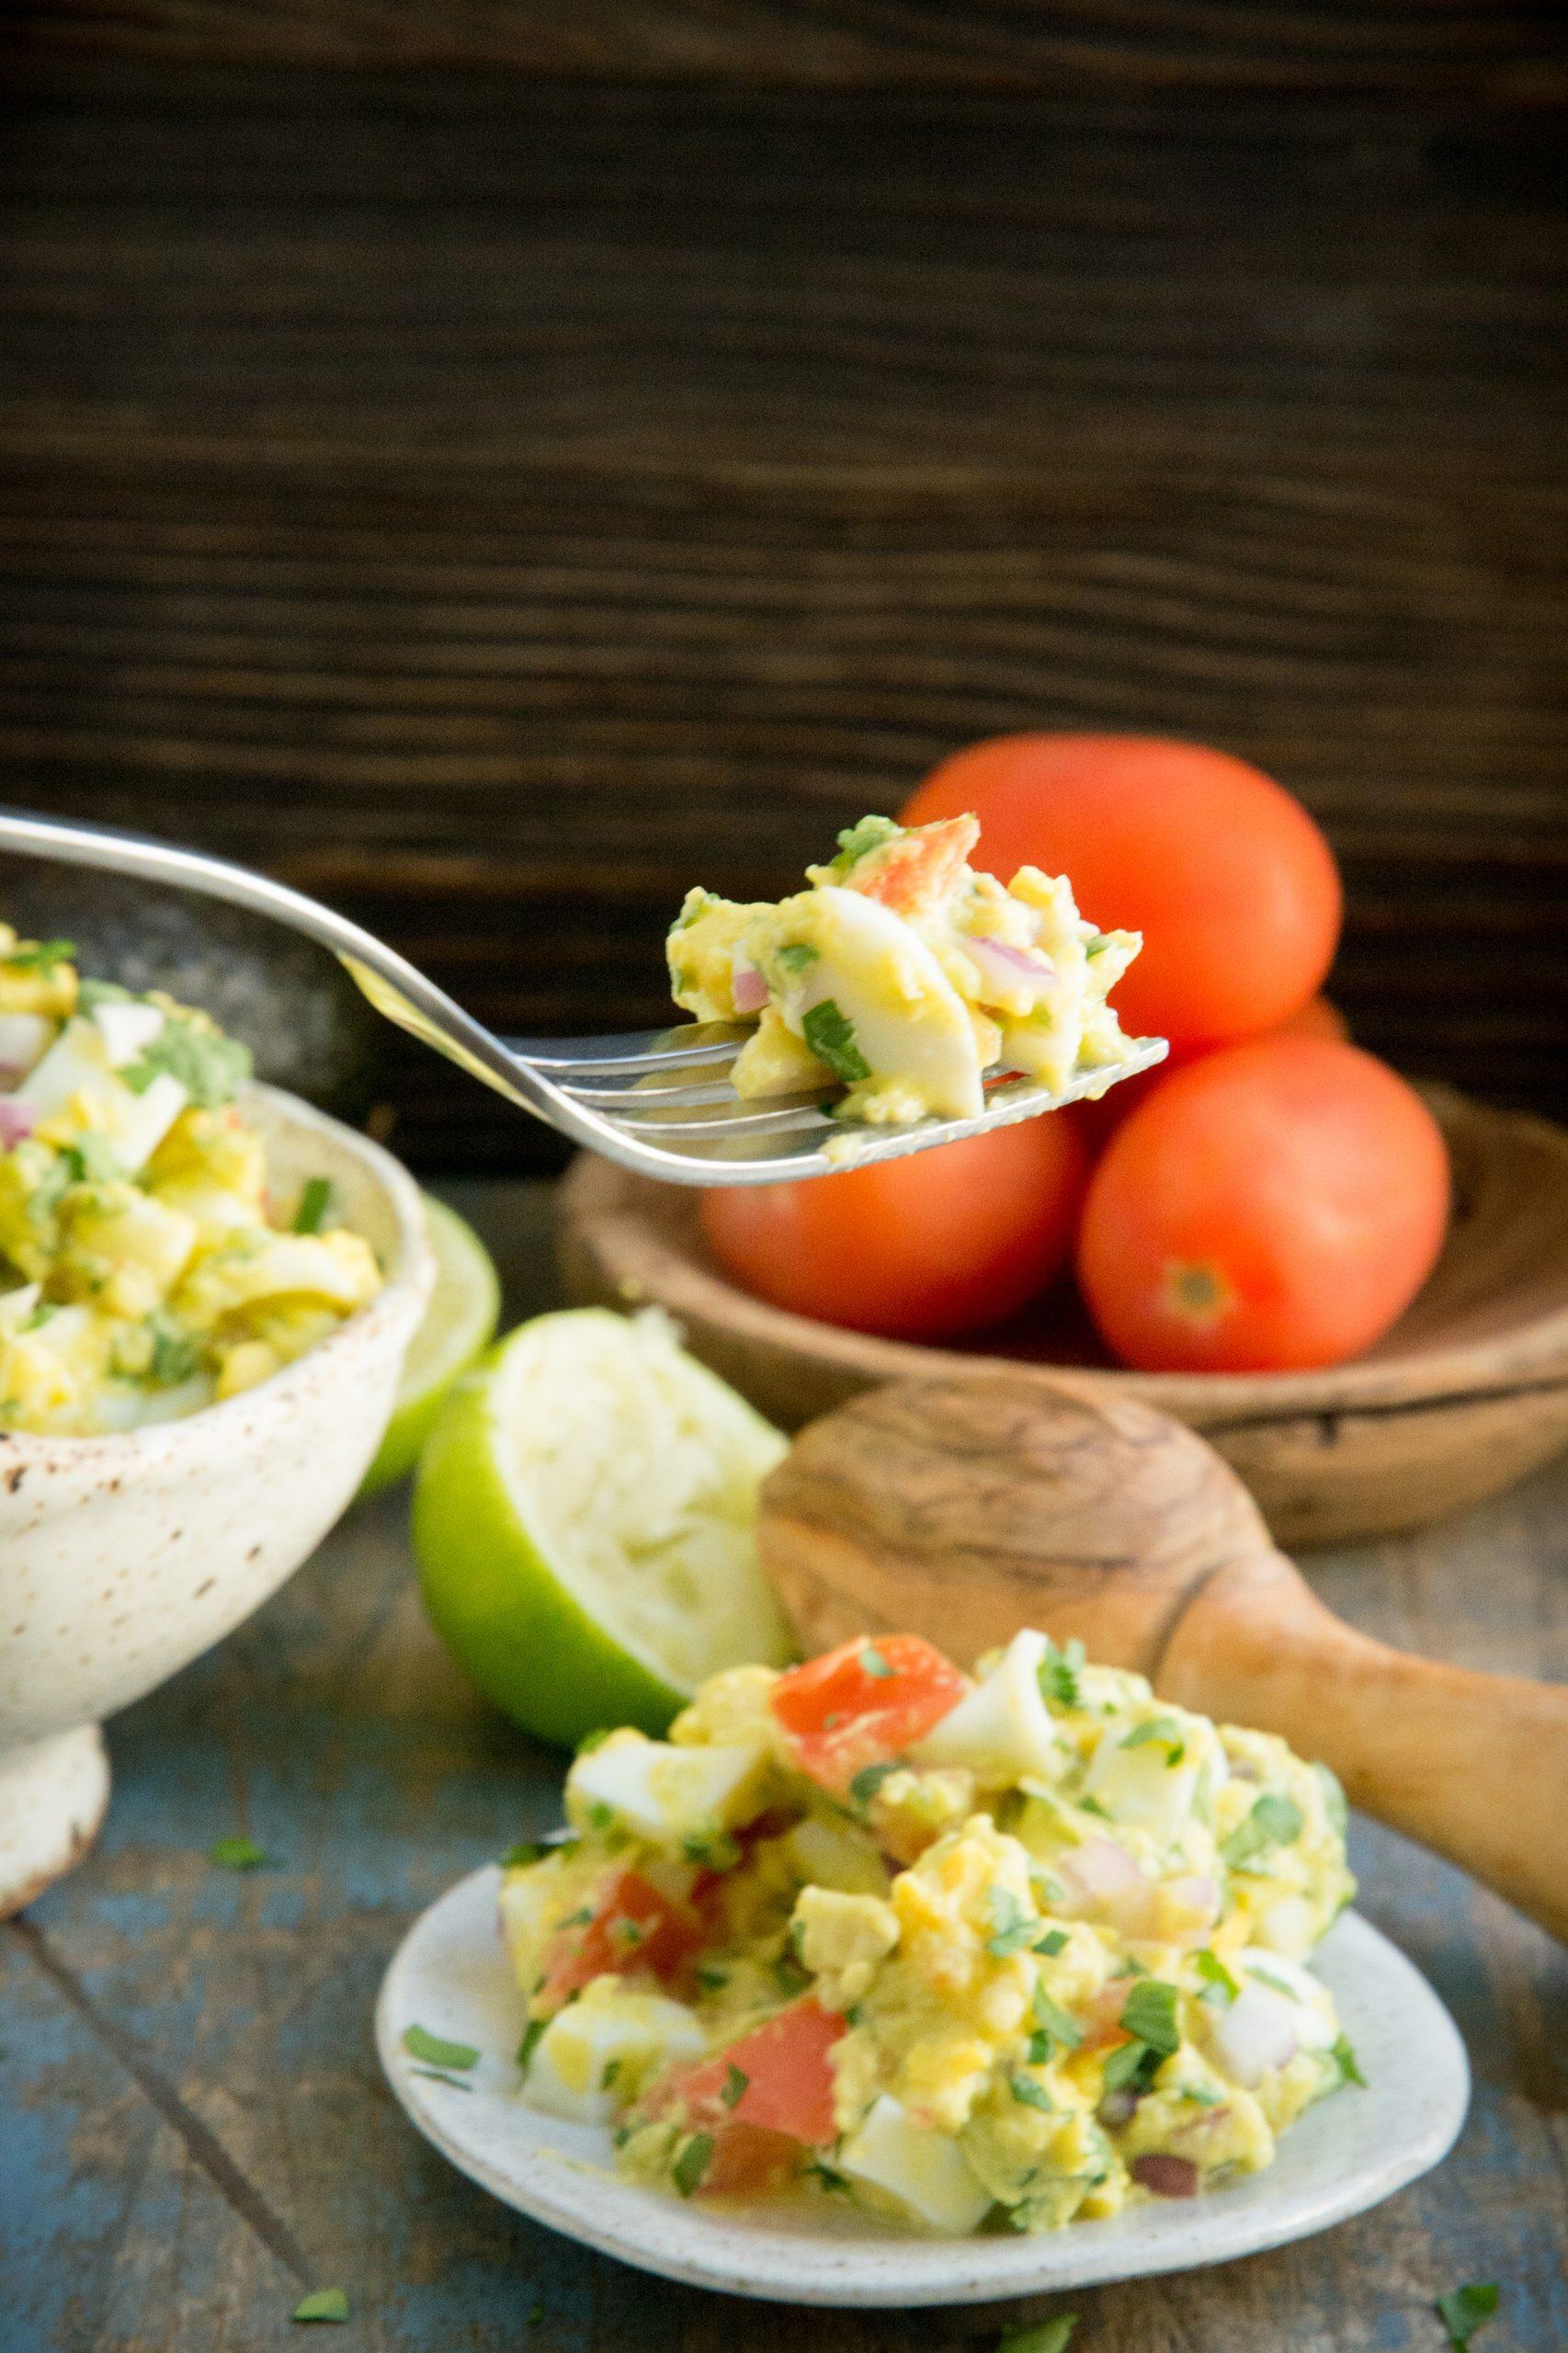 Taking a bite of Avocado Egg Salad.